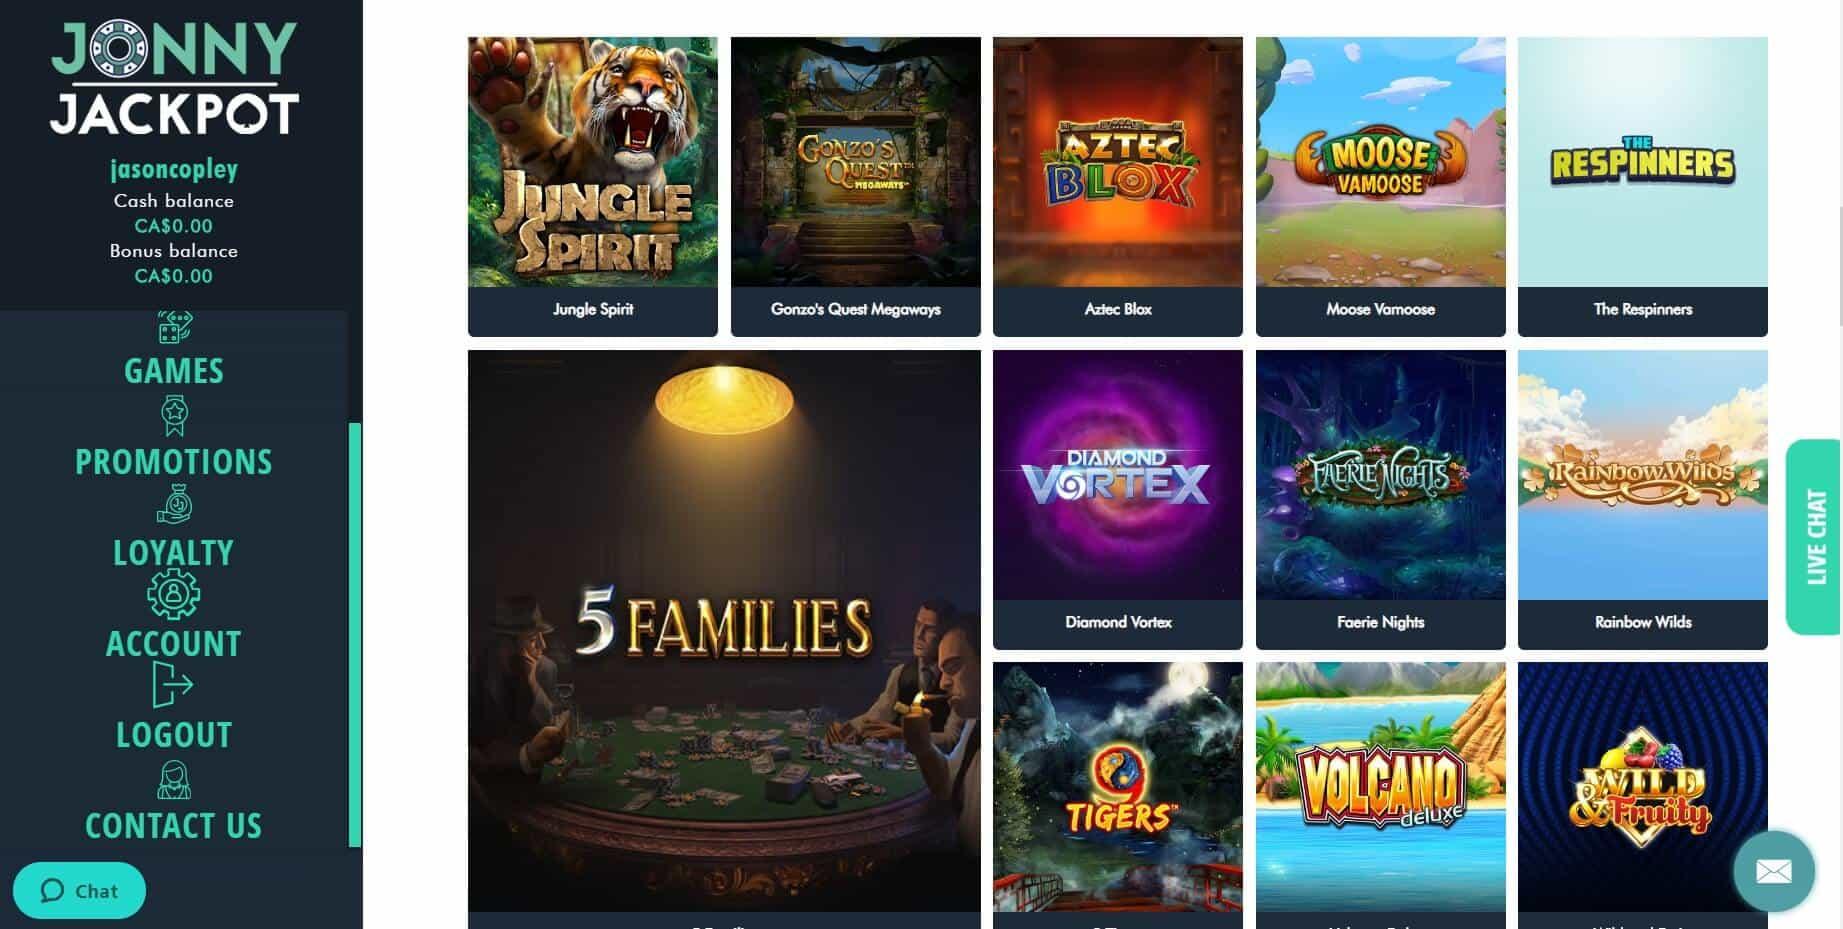 jonny jackpot Casino slots